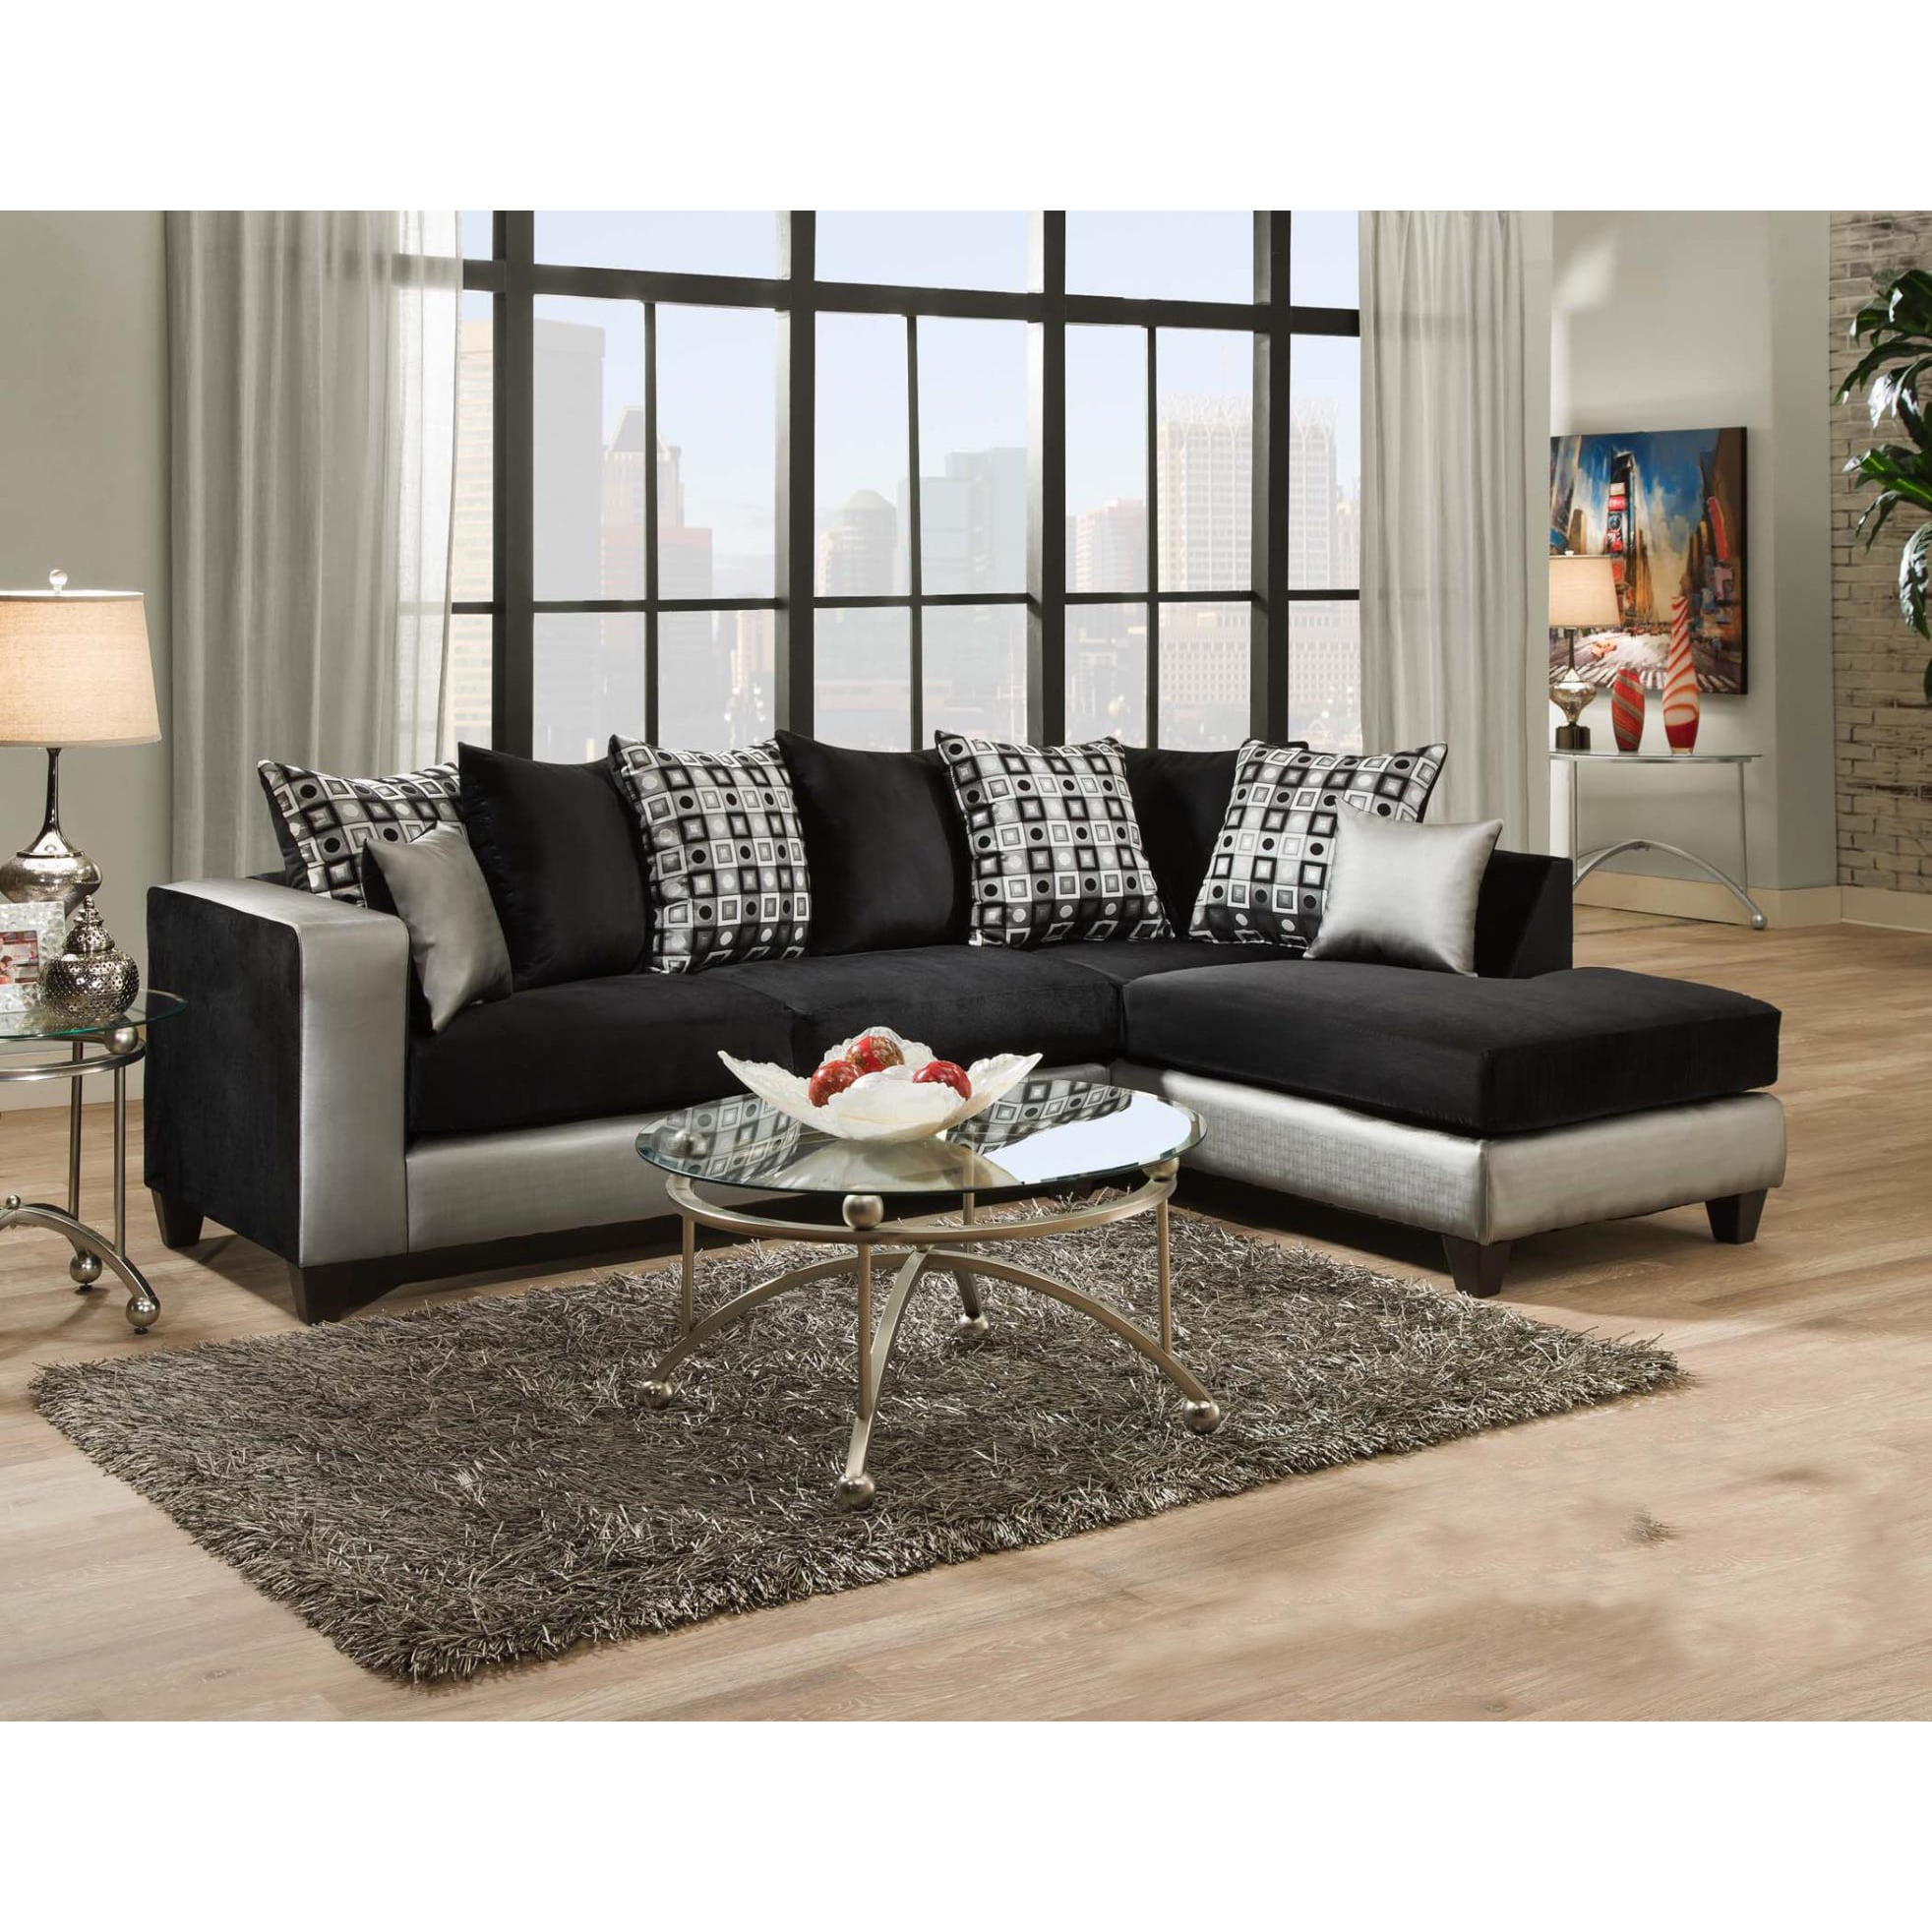 Sofa Trendz Darlene Two-Tone Black Fabric Sectional Sofa